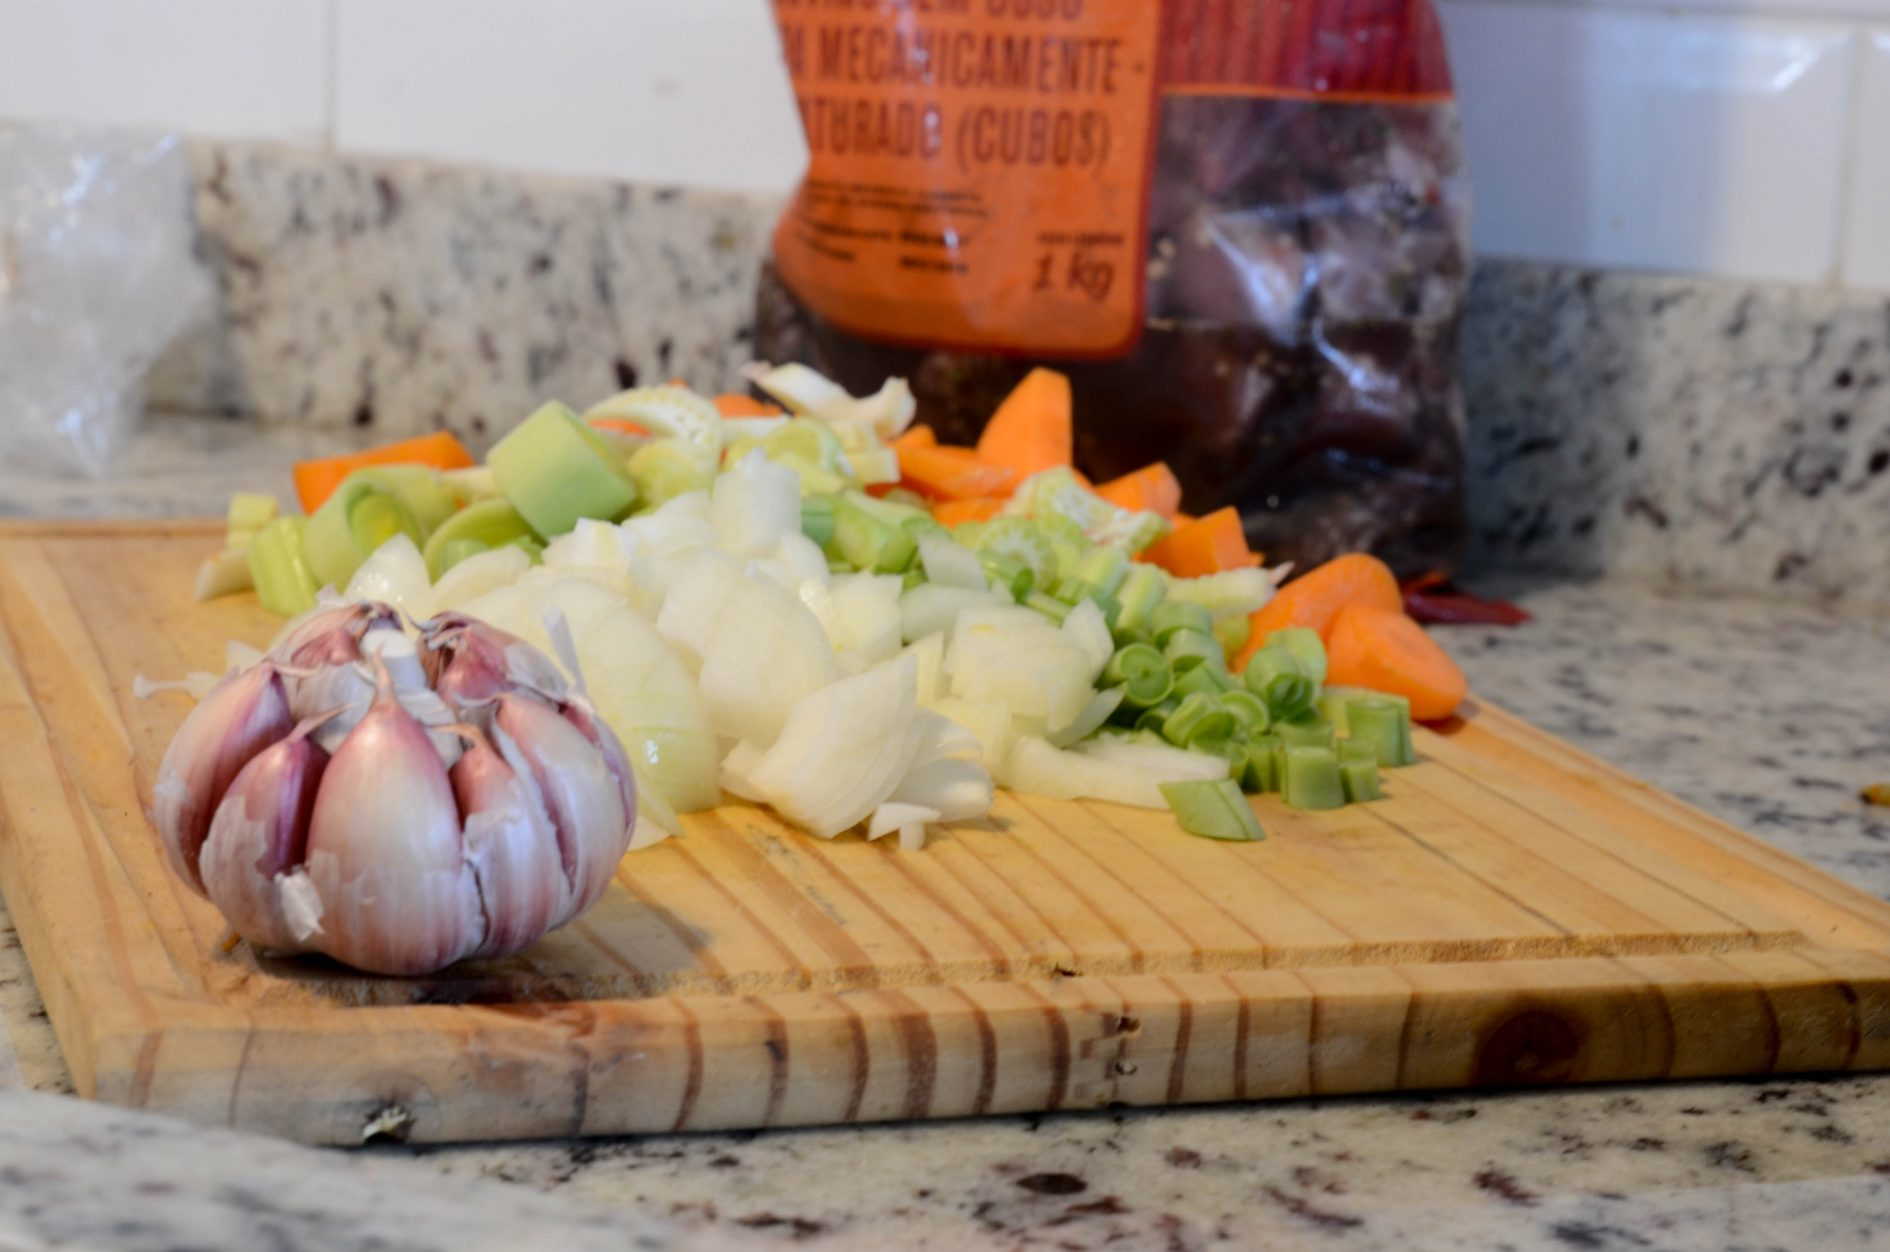 como preparar comida congelada para a semana